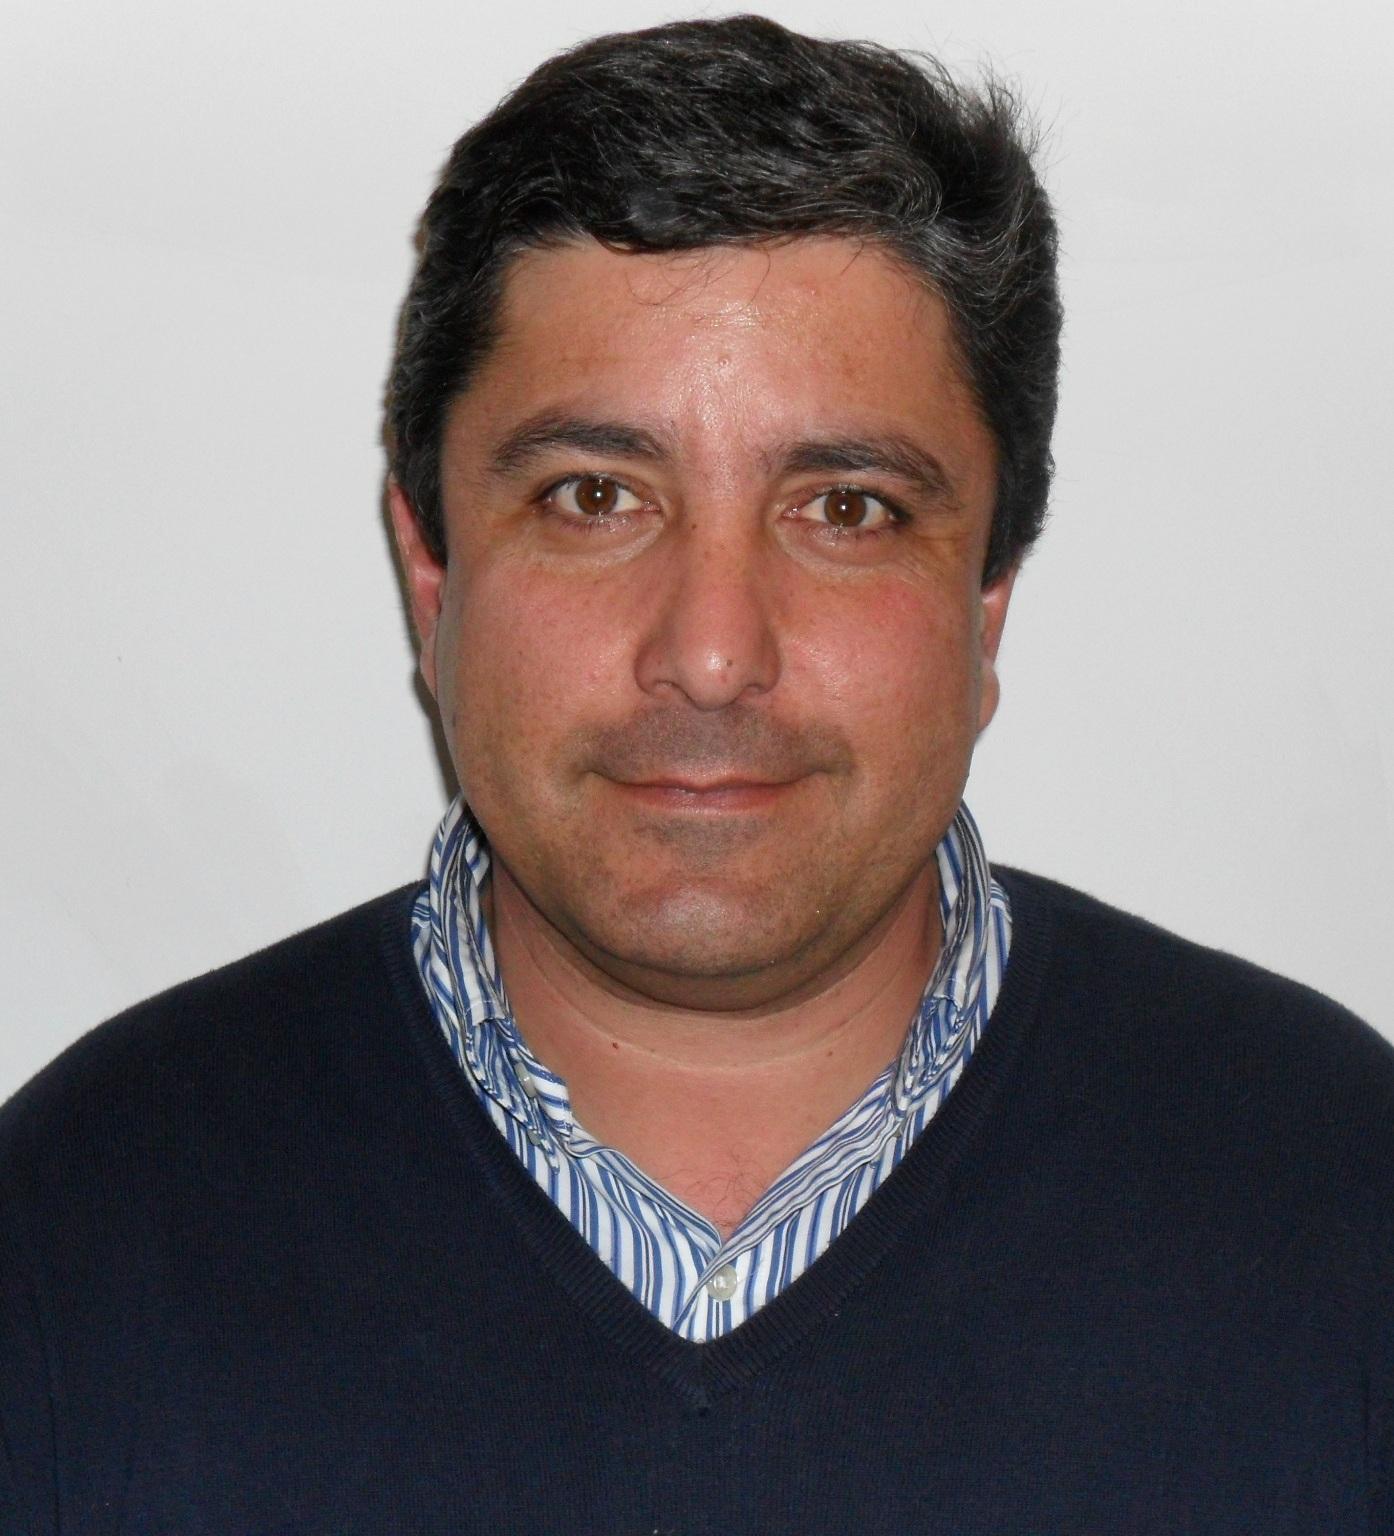 JOSEP ARIAS BALTA